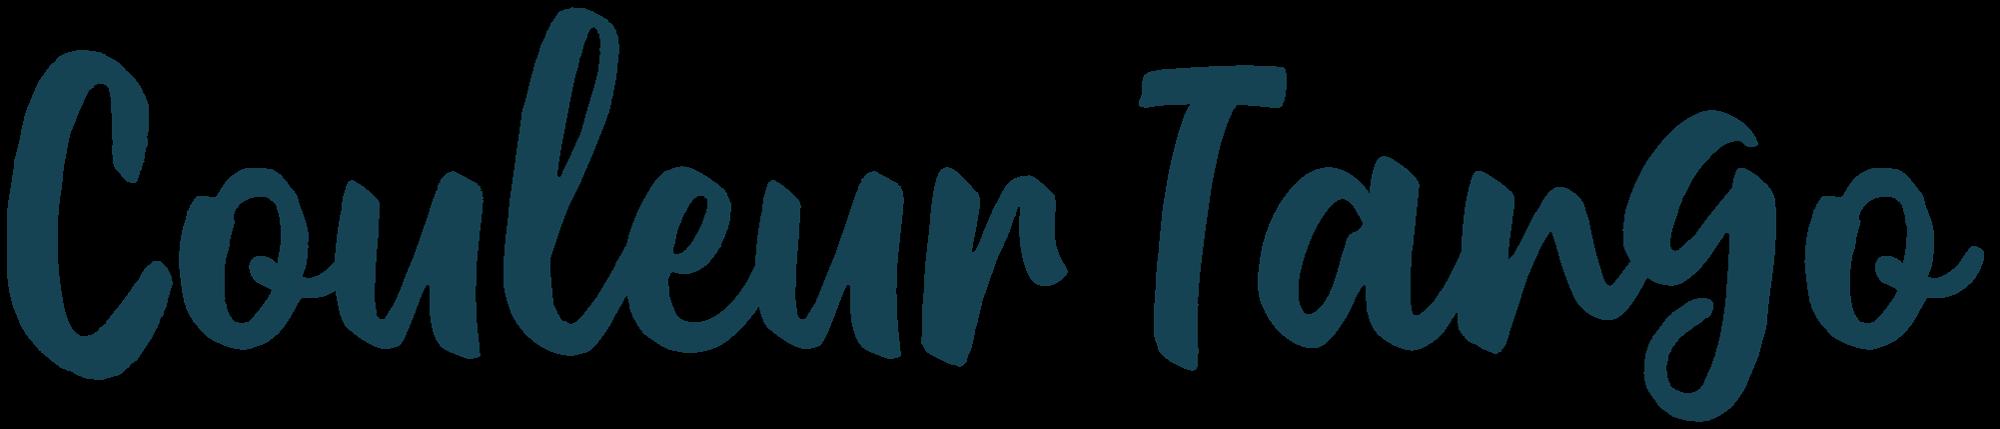 logo couleur tango